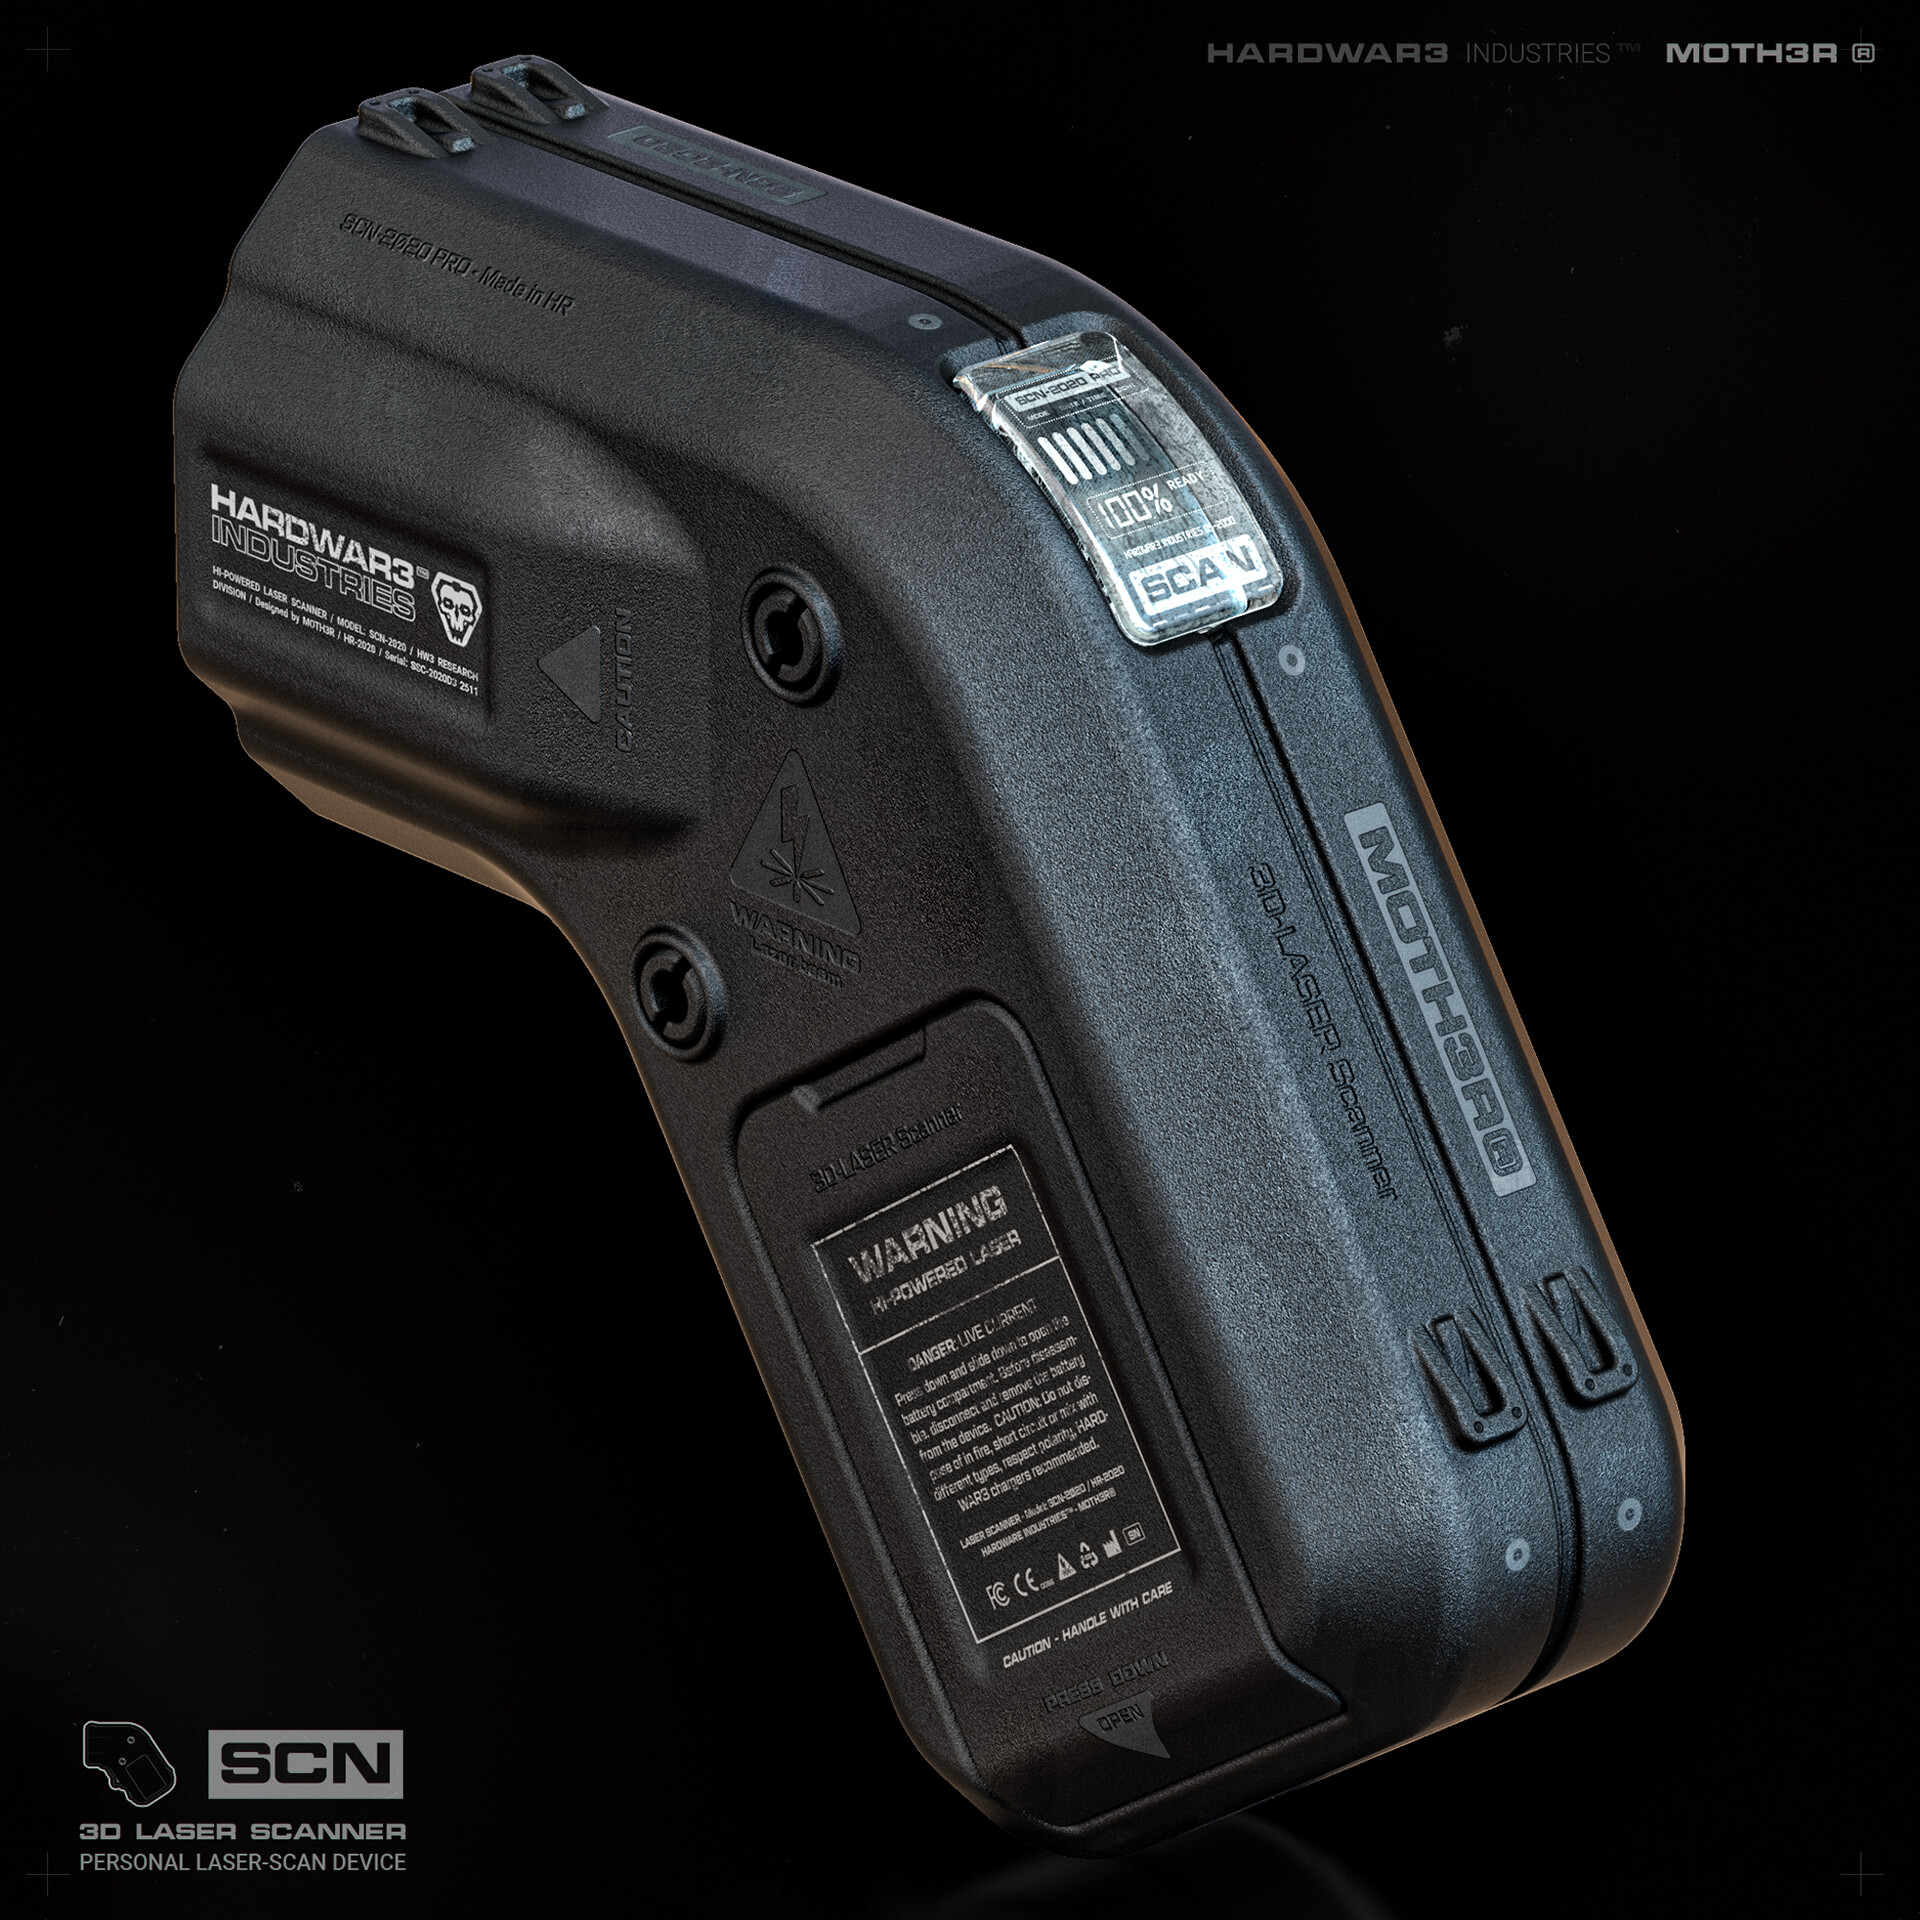 Scanner-001.66B